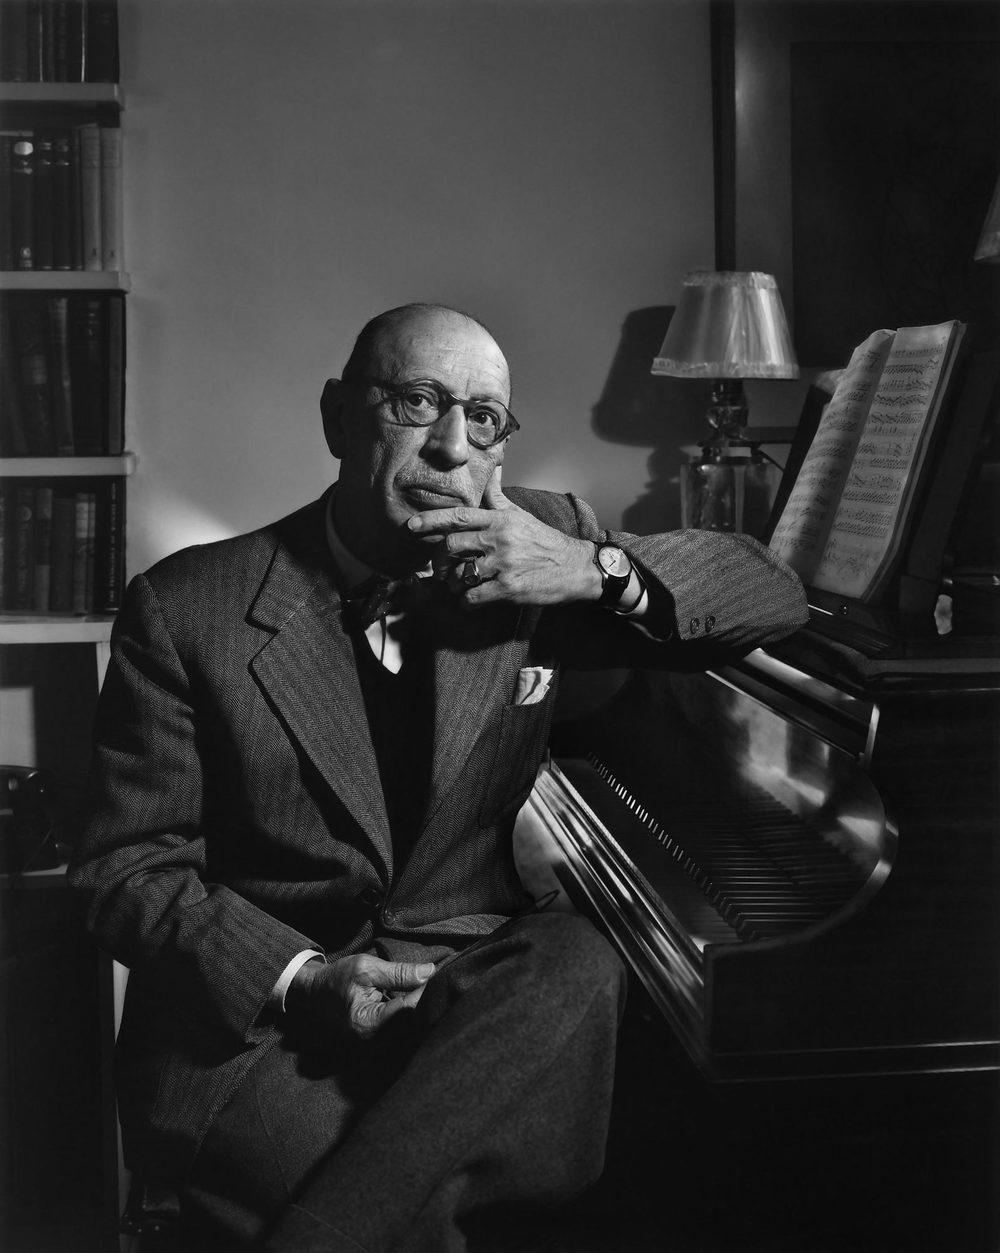 Yousuf-Karsh-Igor-Stravinsky-1956.jpg